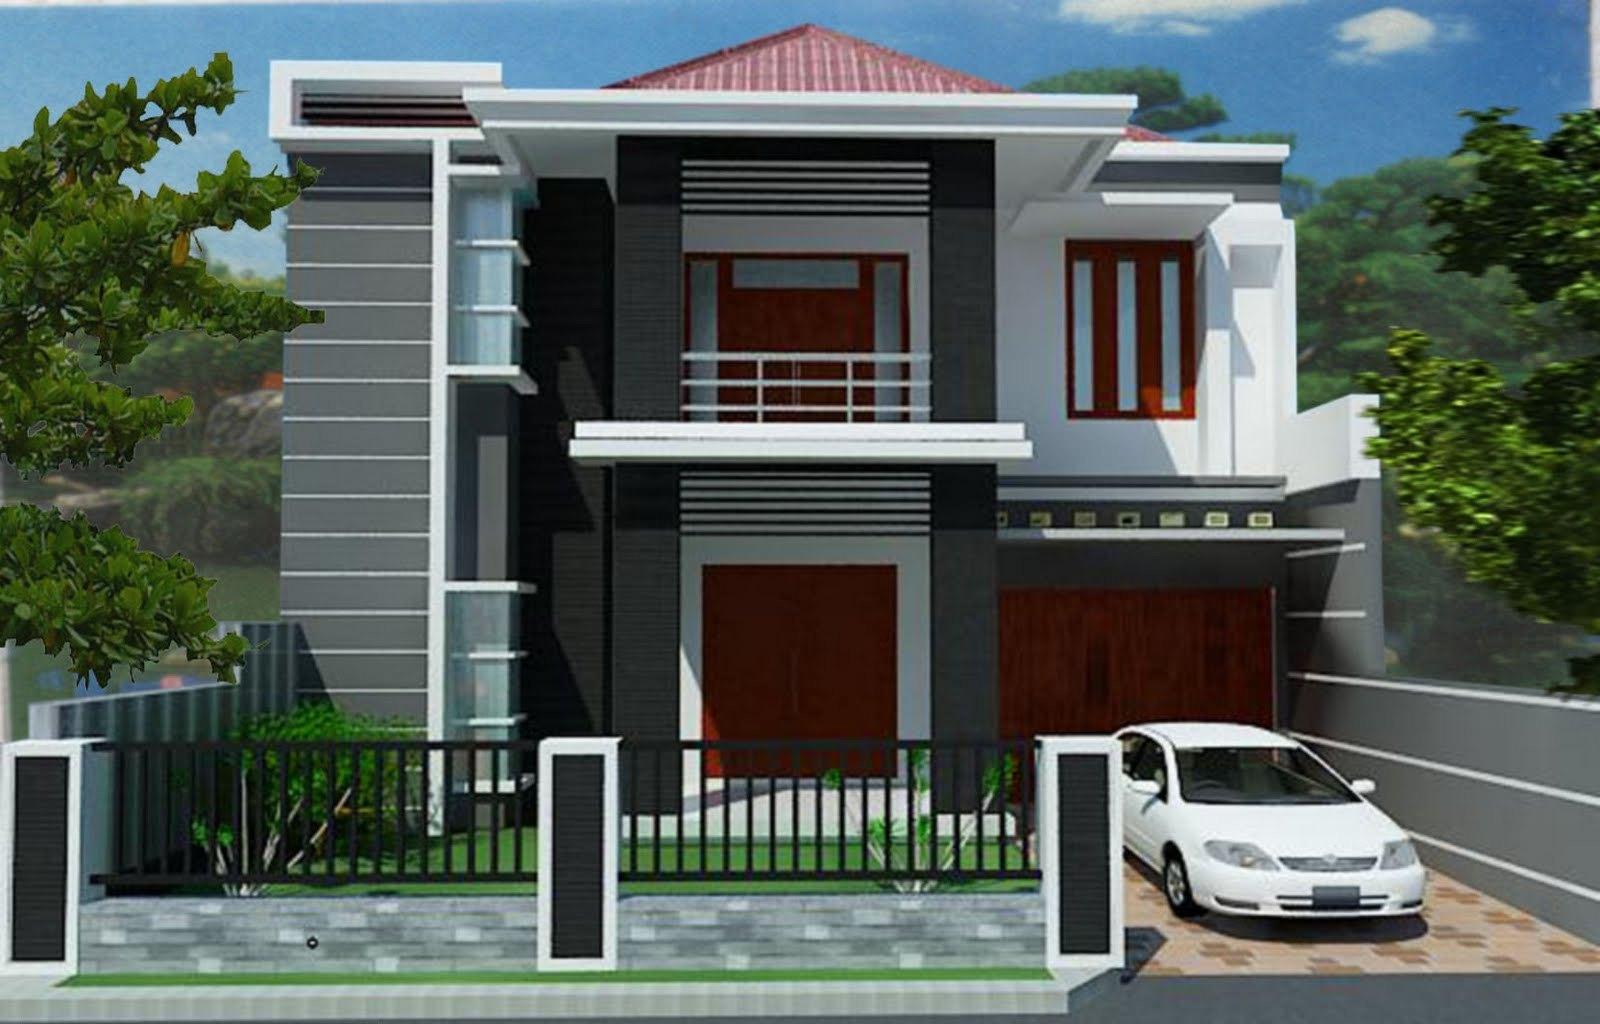 10 desain denah rumah minimalis modern 2 lantai type 45 - Desain Rumah Minimalis 2 Lantai Terbaru